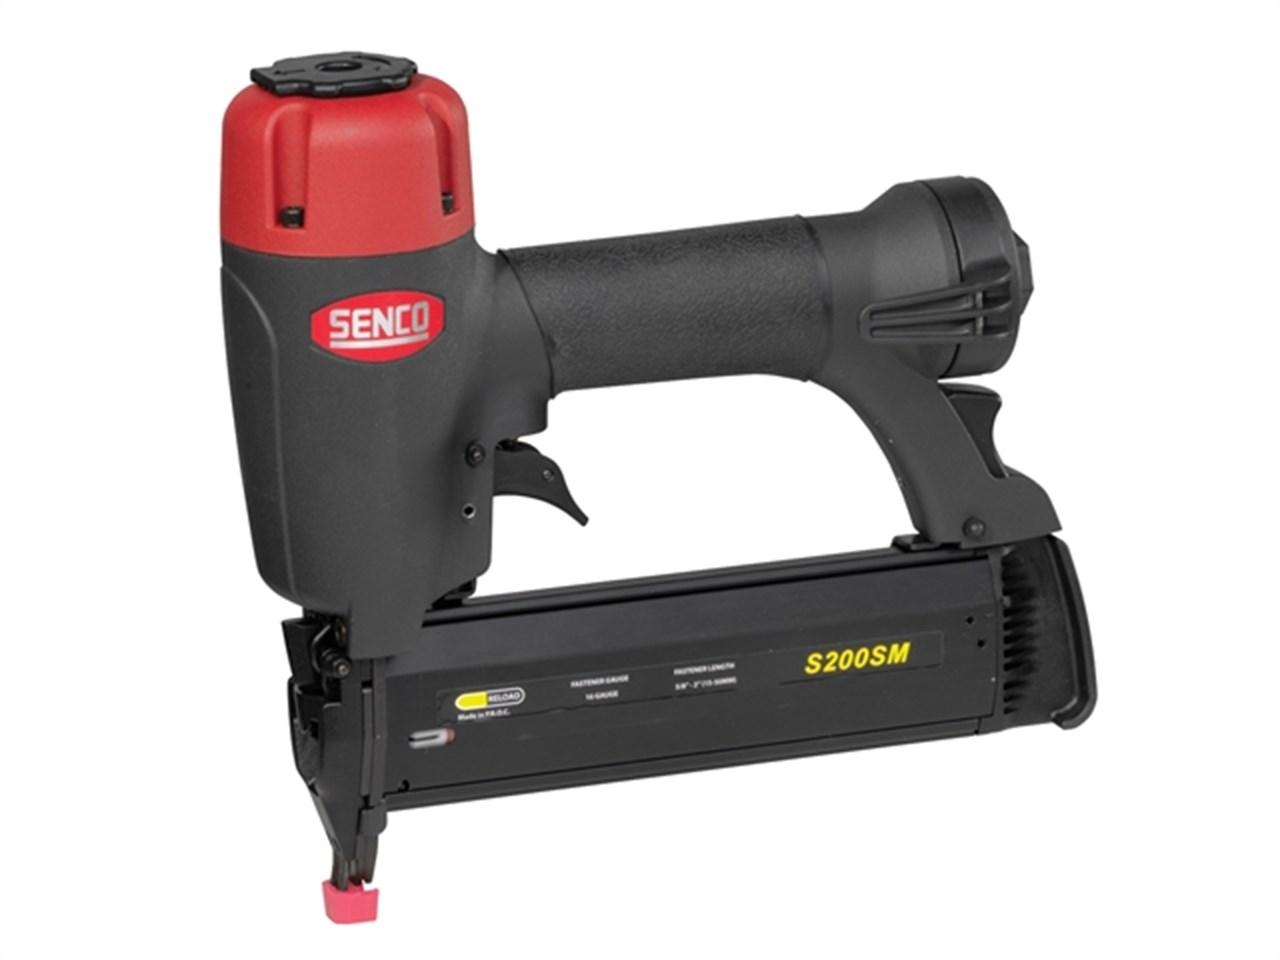 Senco S200SM Pneumatic Semi Pro Brad Nailer 16G.